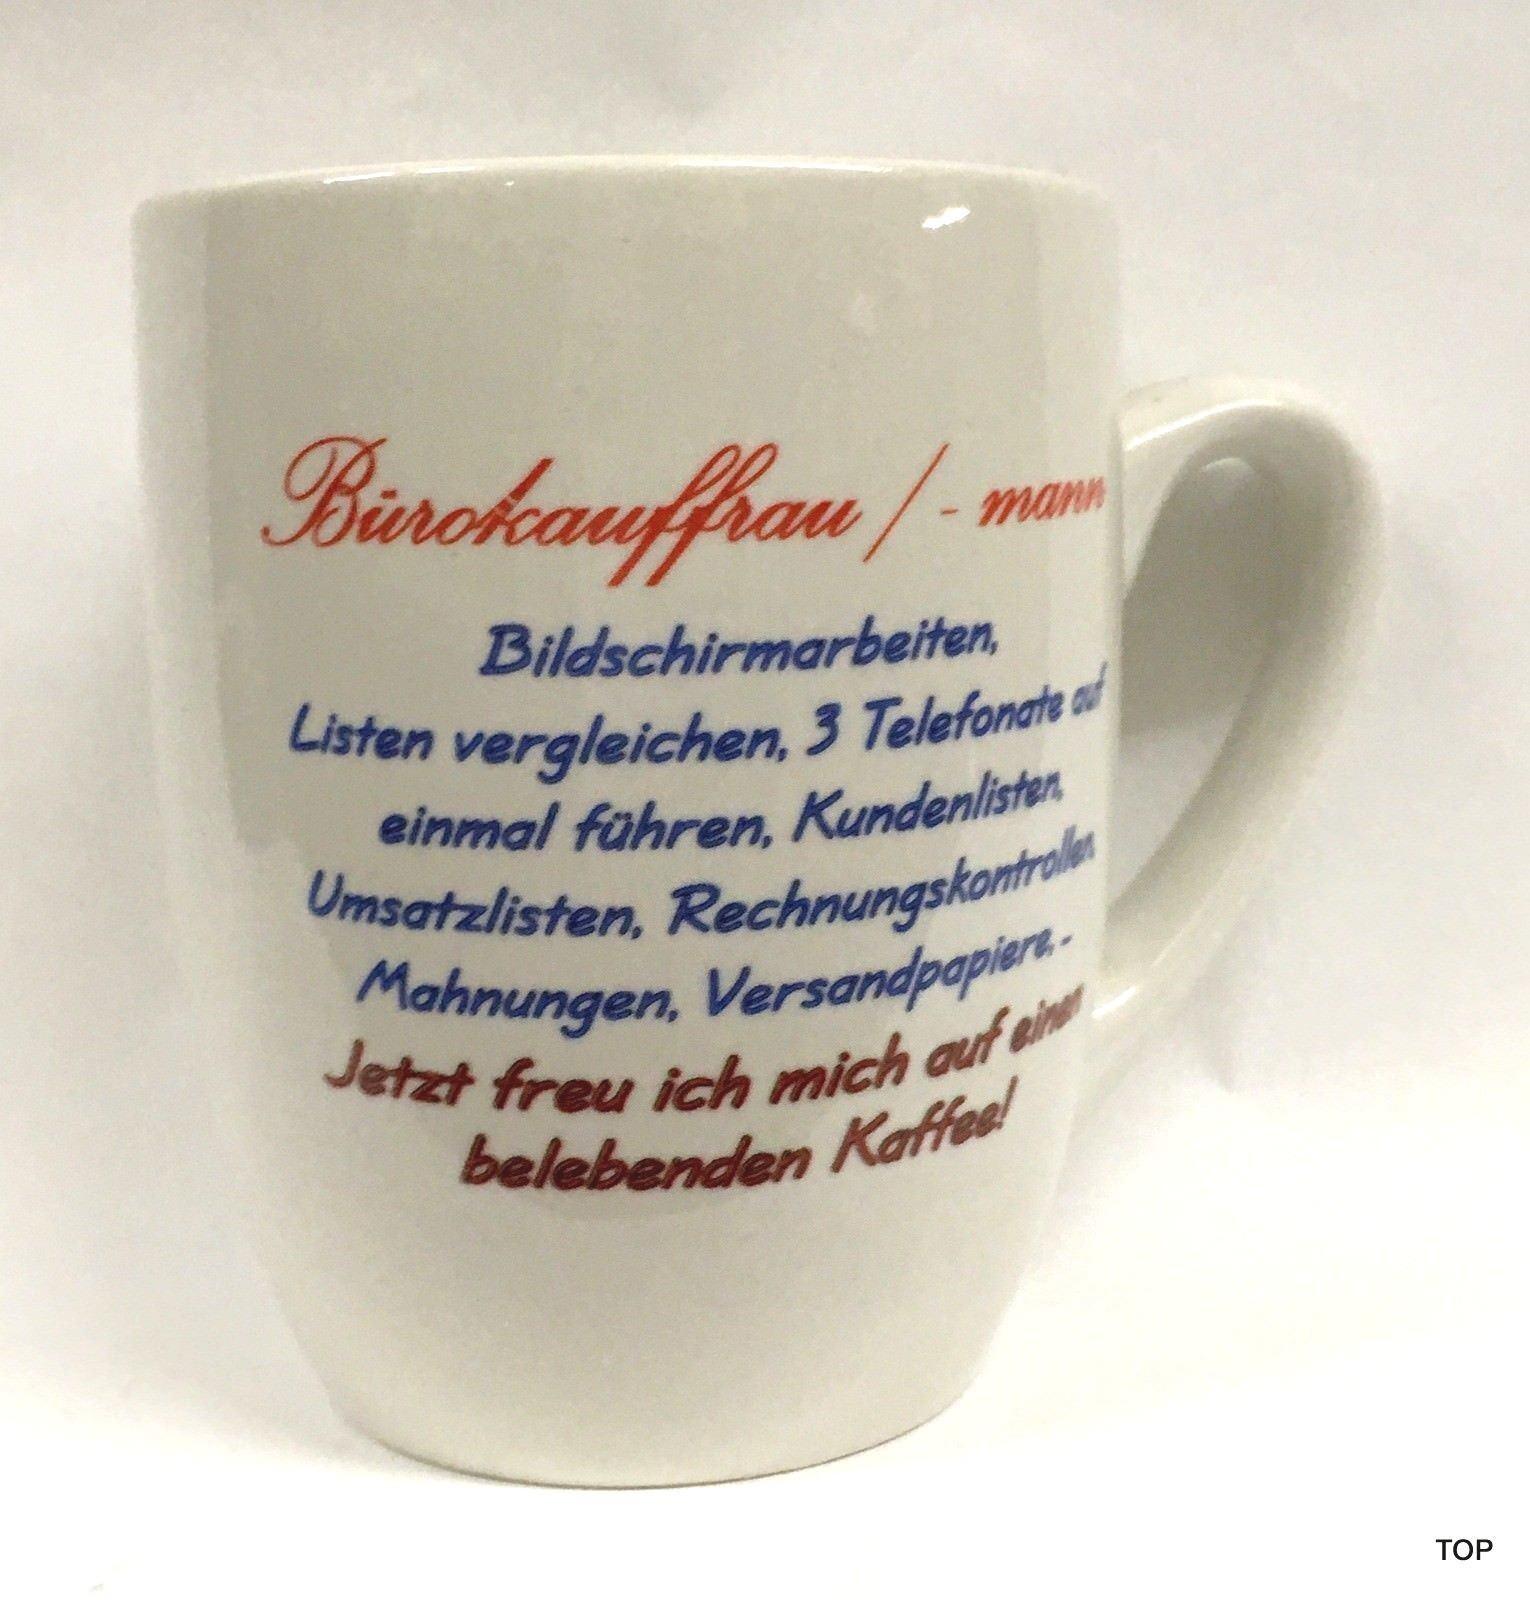 Cup Bürokauffrau Mann Handle Cup Coffee Mug Extraordinary Gift Idea